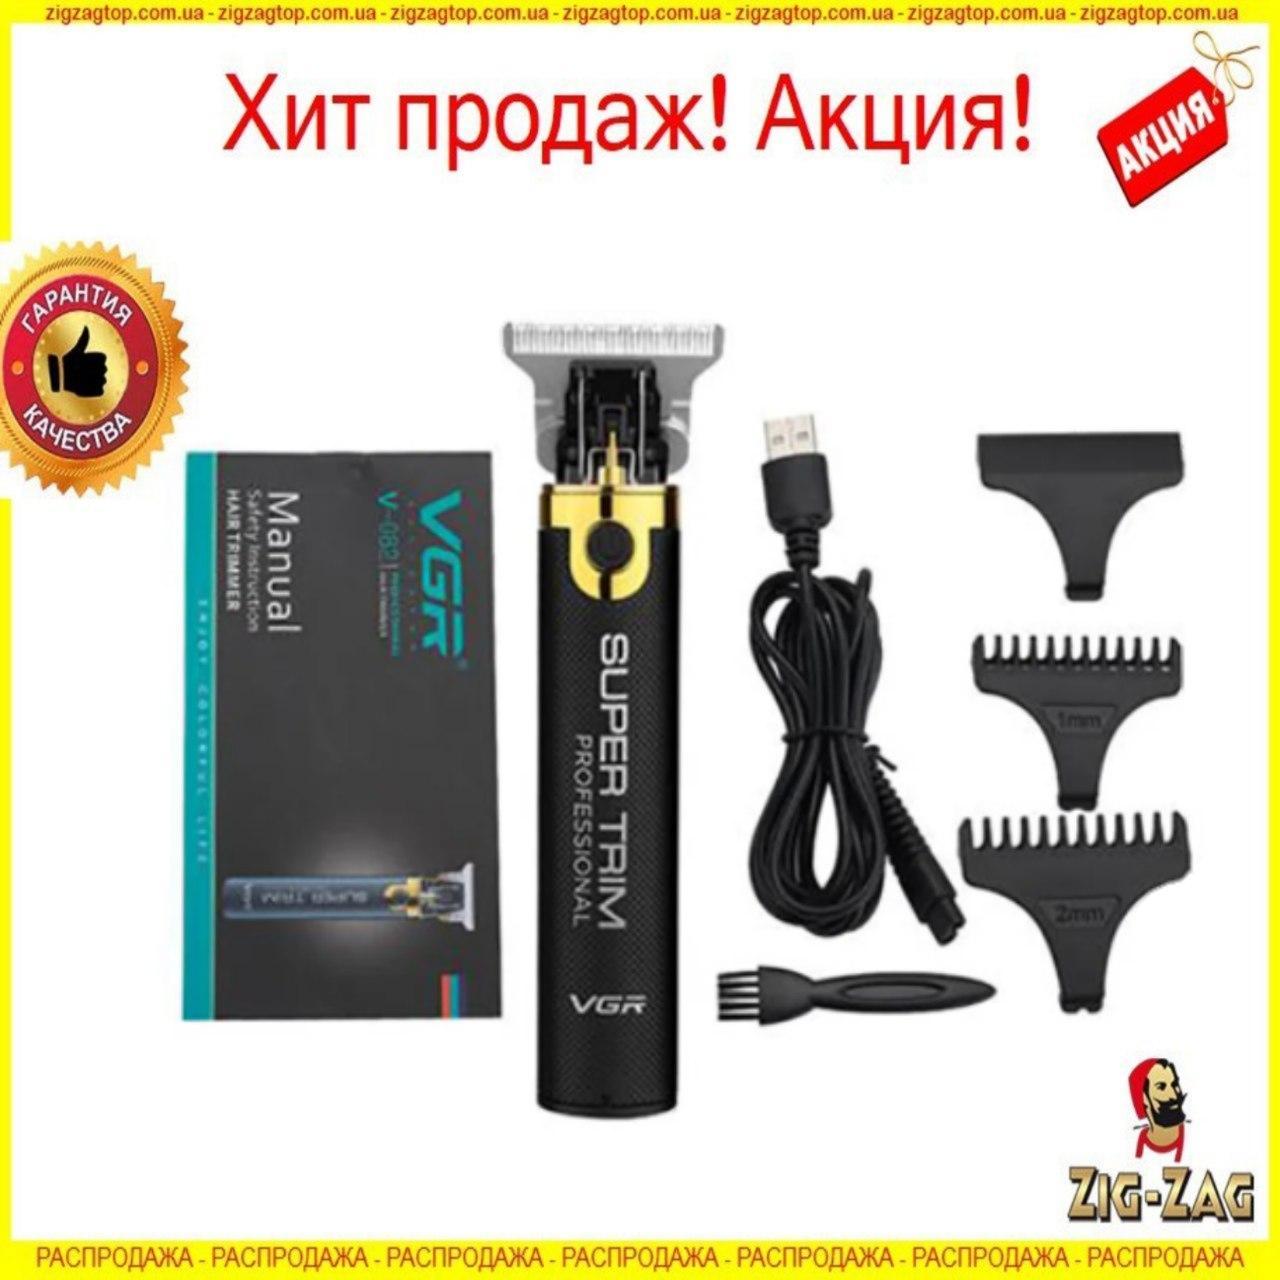 Профессиональная машинка Super Trim VGR V-082 для стрижки волосся Голови Вусів і Бороди Бритва Триммер